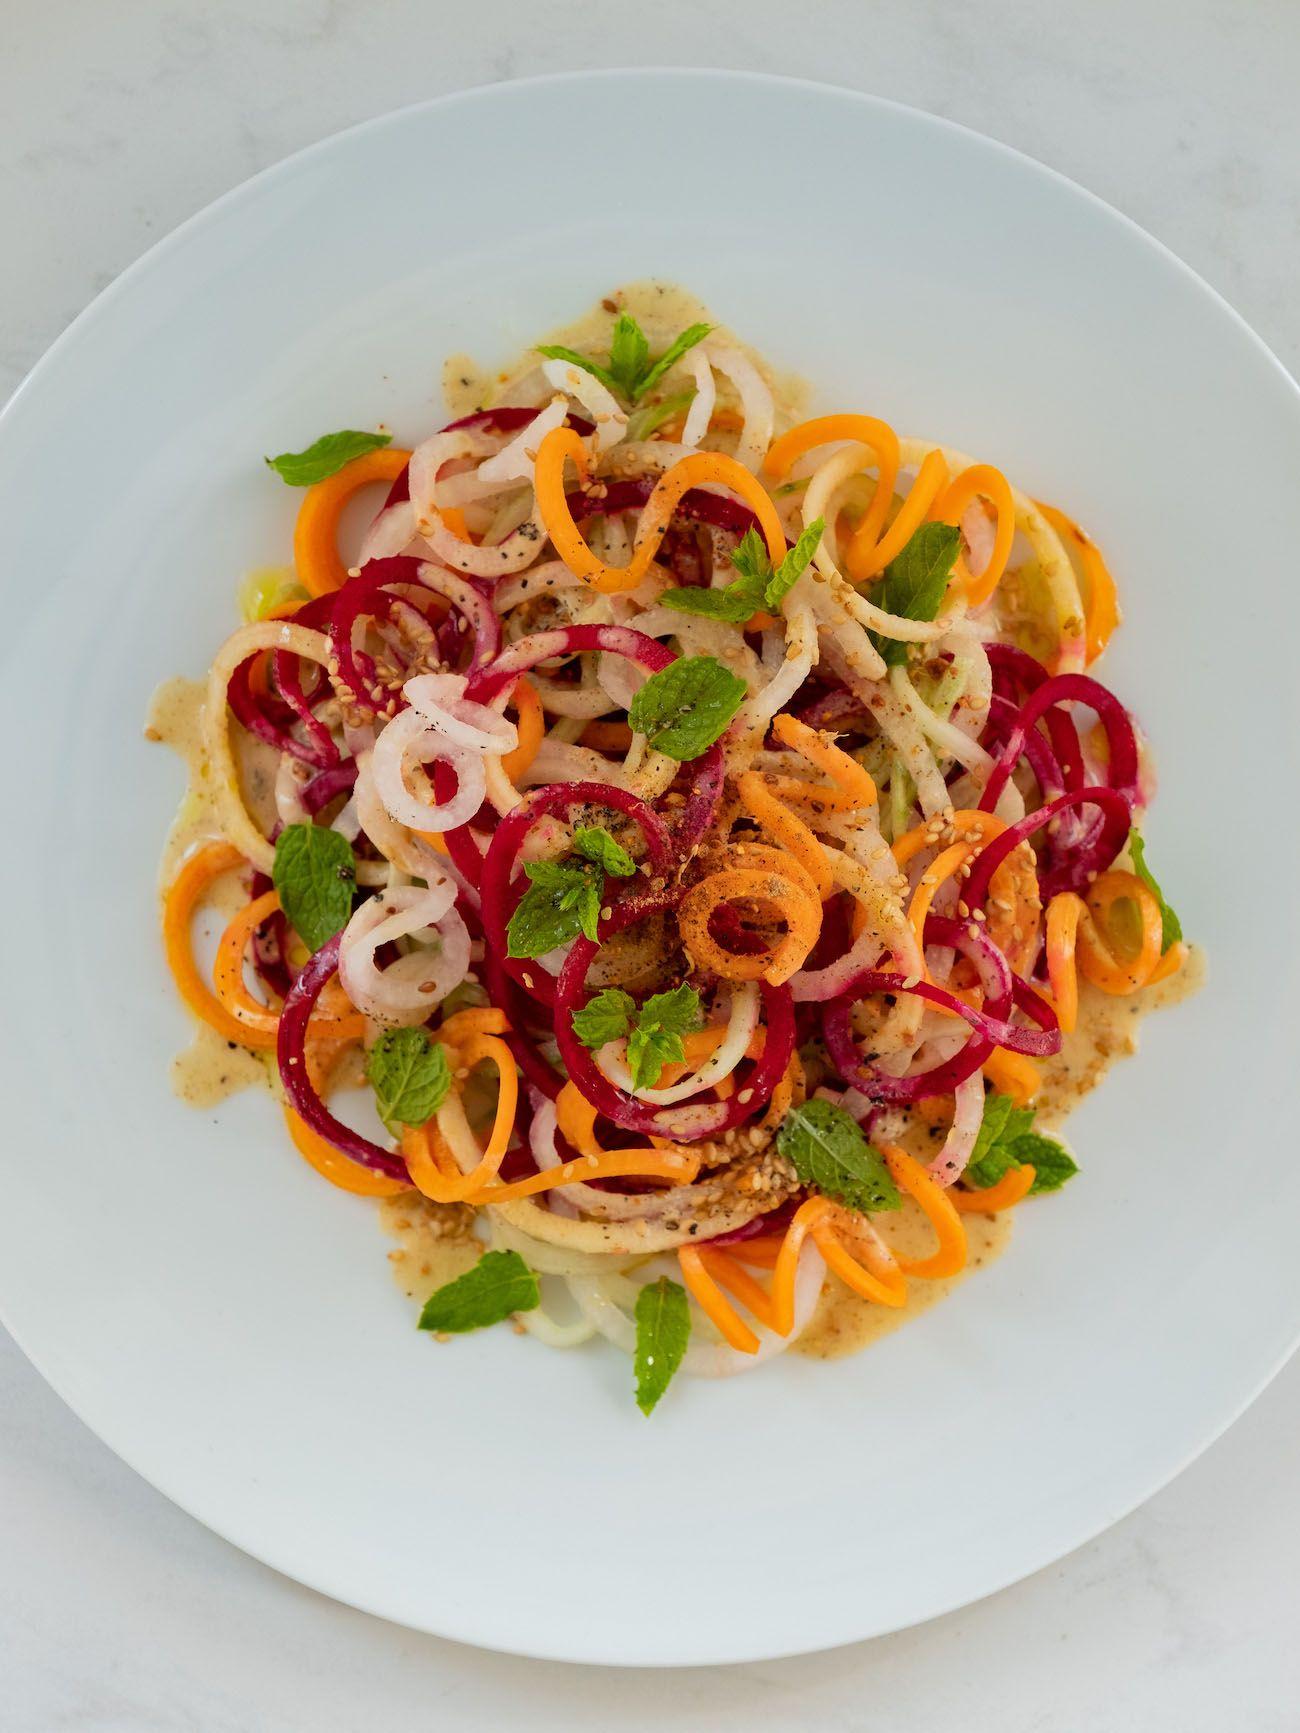 About Fuel, Foodblog, Rezept, Bunter Spiralensalat mit Tahini-Dressing, Just Spices, Gurke, Karotte, Apfel